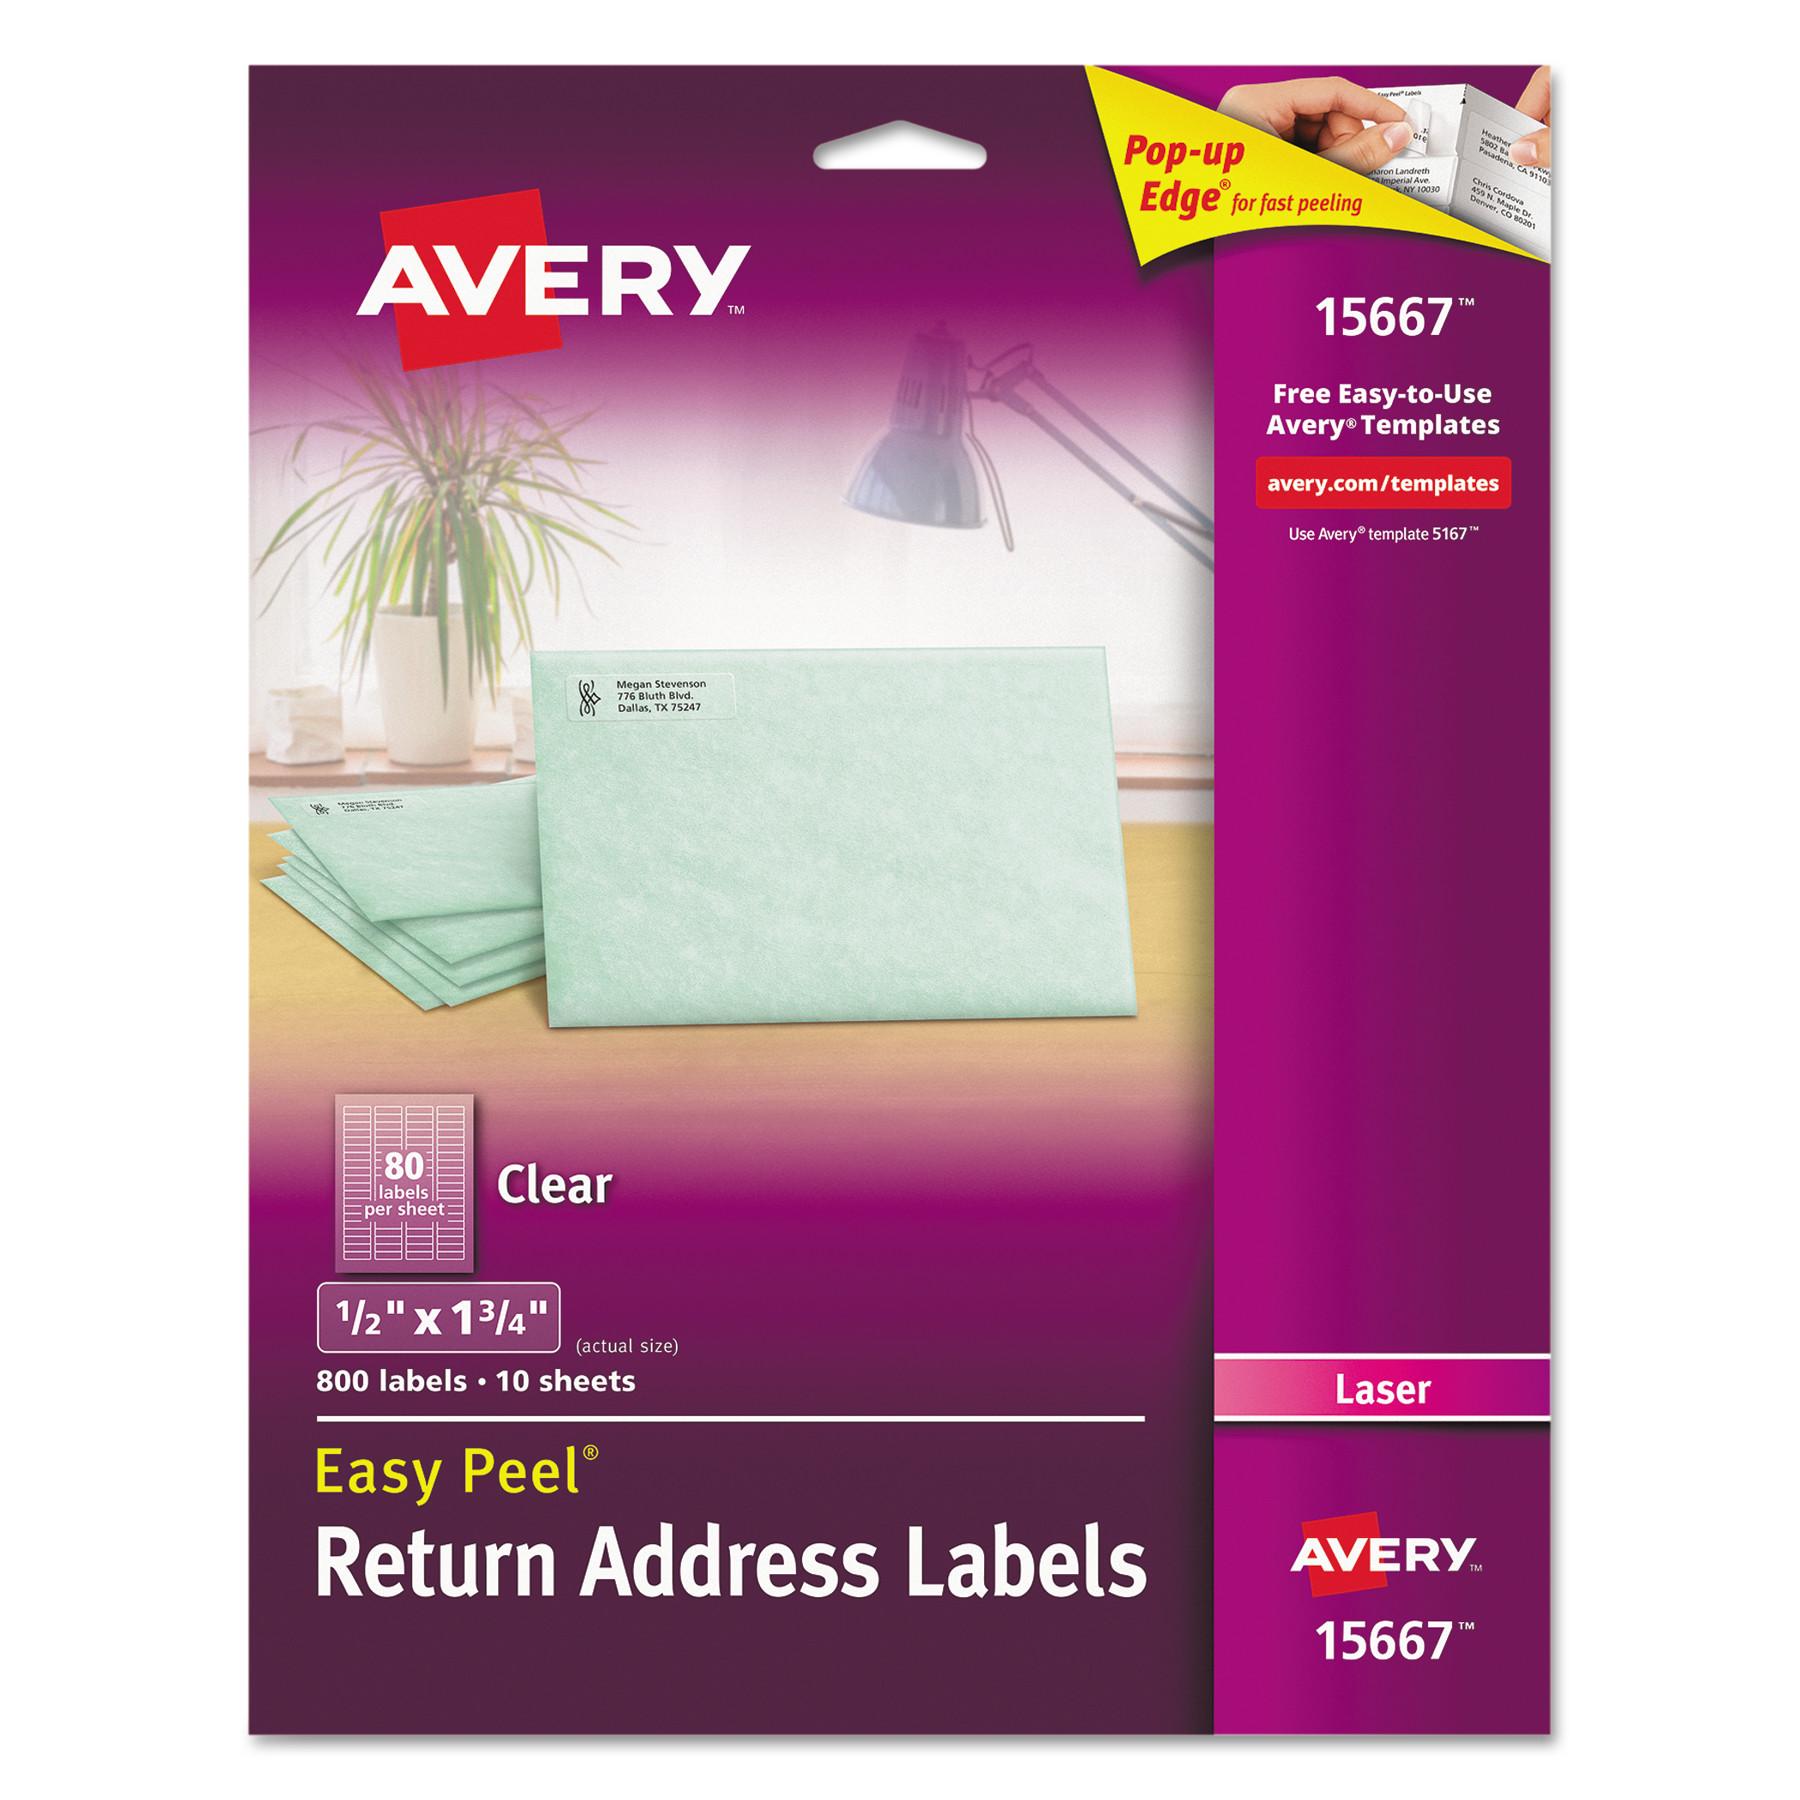 Avery Matte Clear Easy Peel Return Address Labels, Laser, 1/2 x 1 3/4, 800/Pack -AVE15667